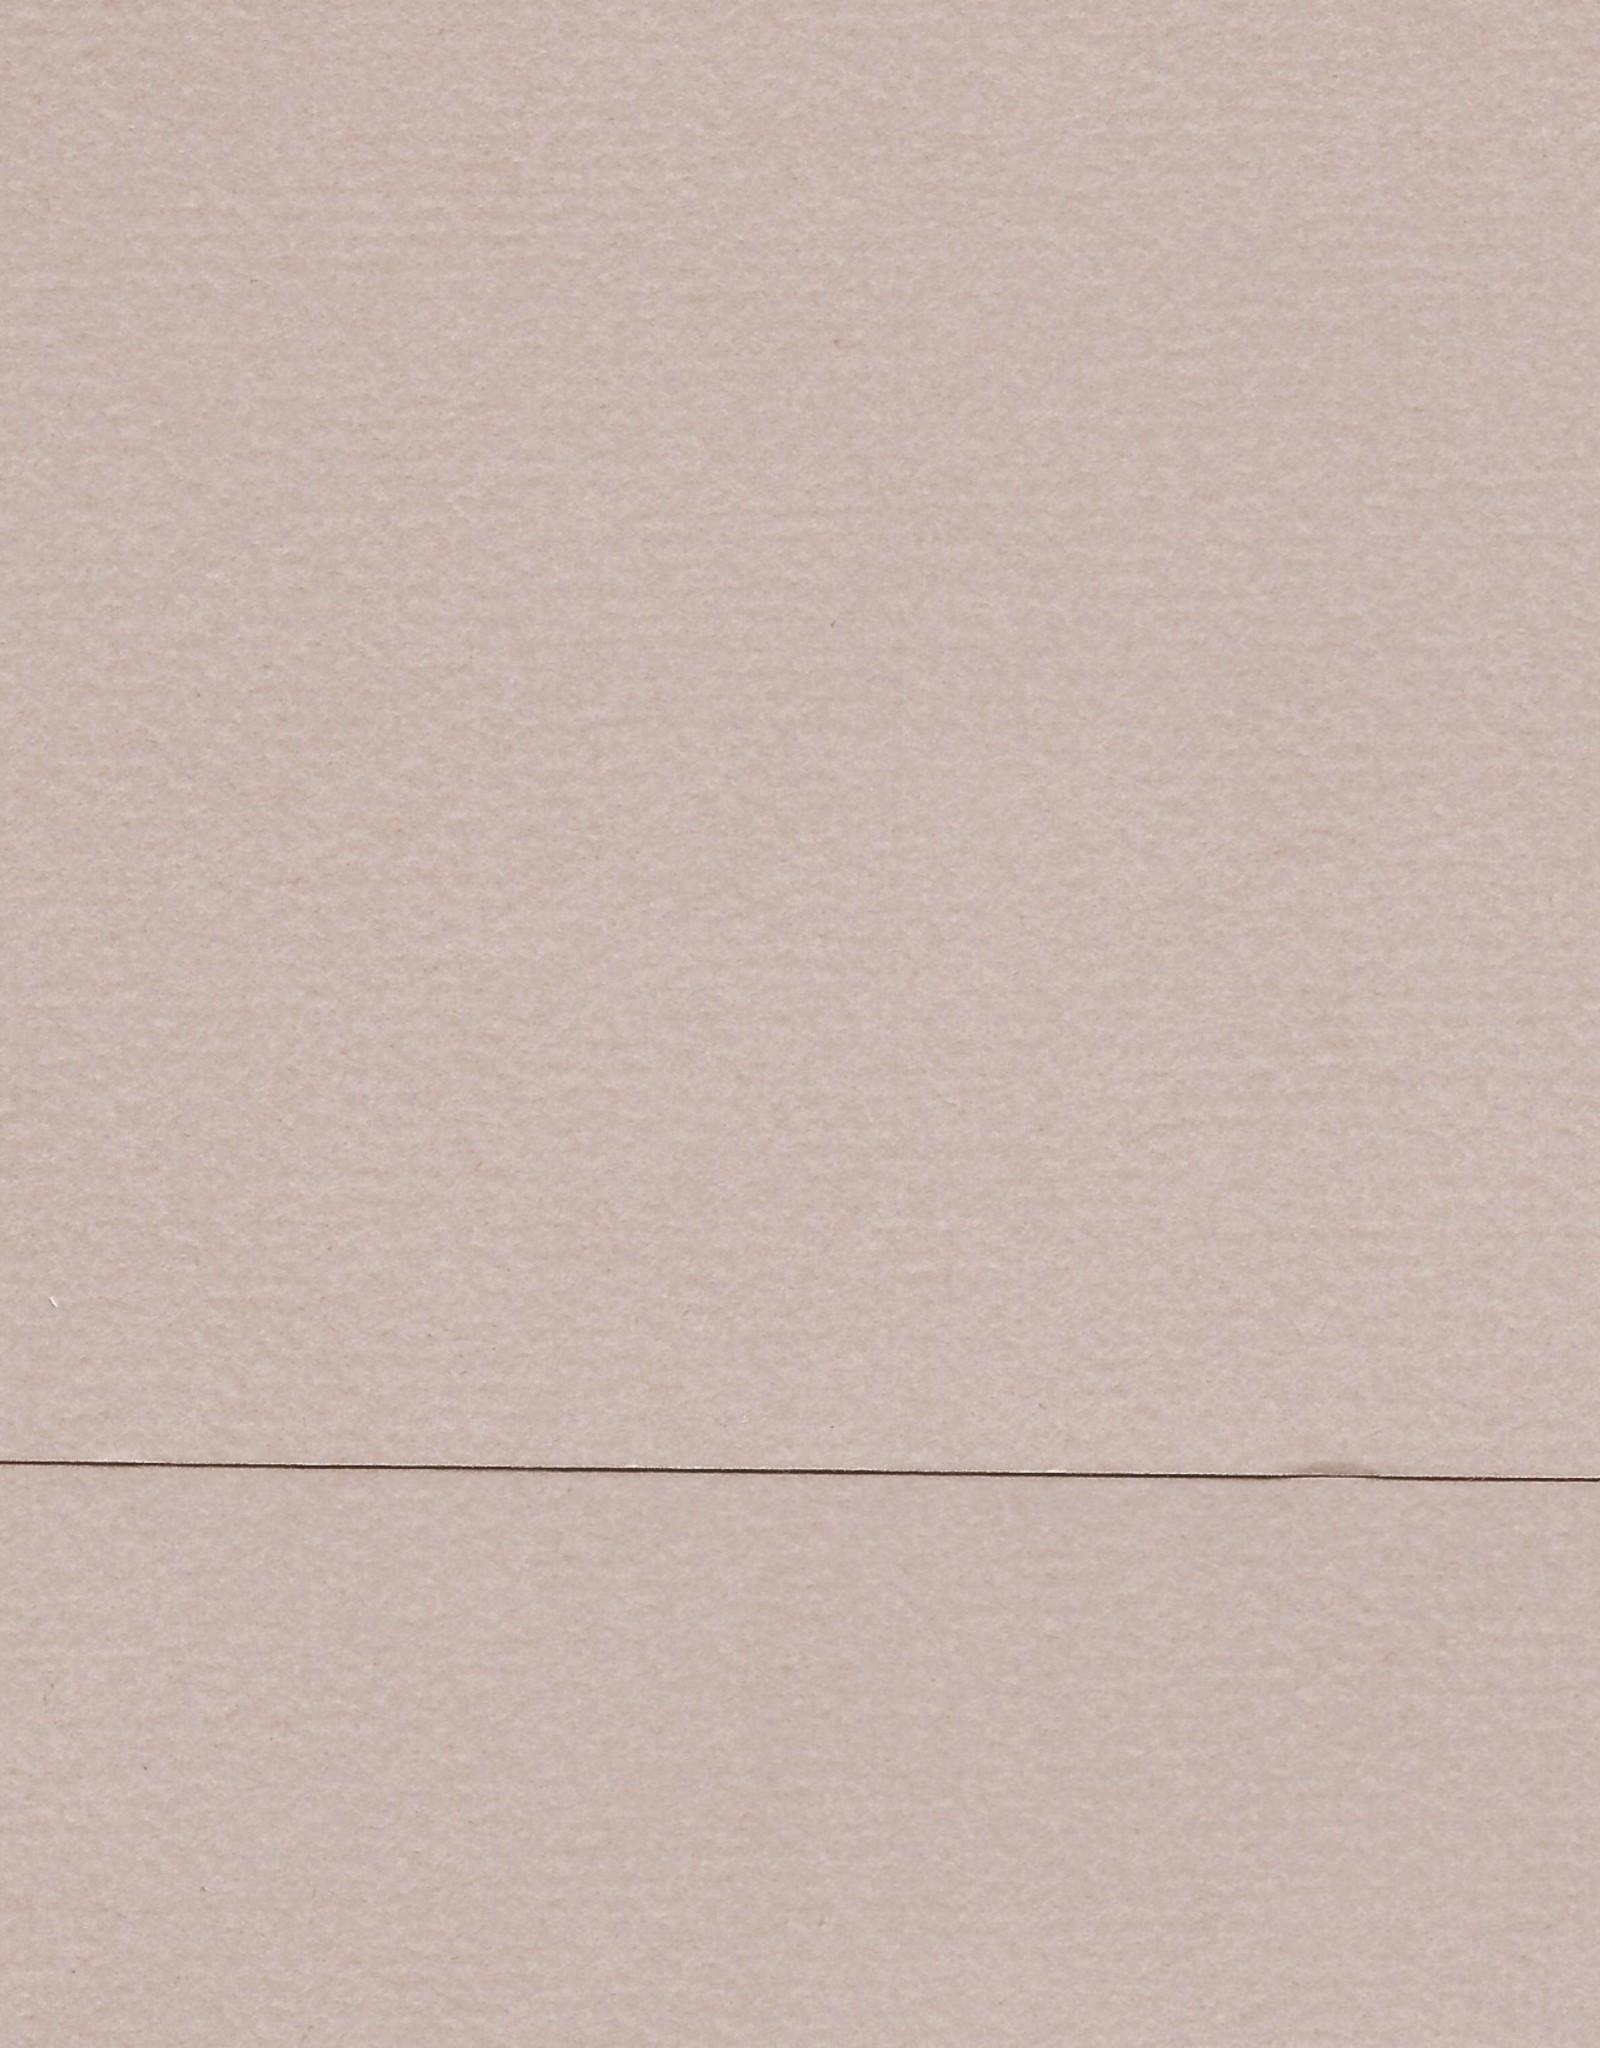 "Hahnemuhle Bugra, Caramel #316, 33"" x 41"" 130 gsm"